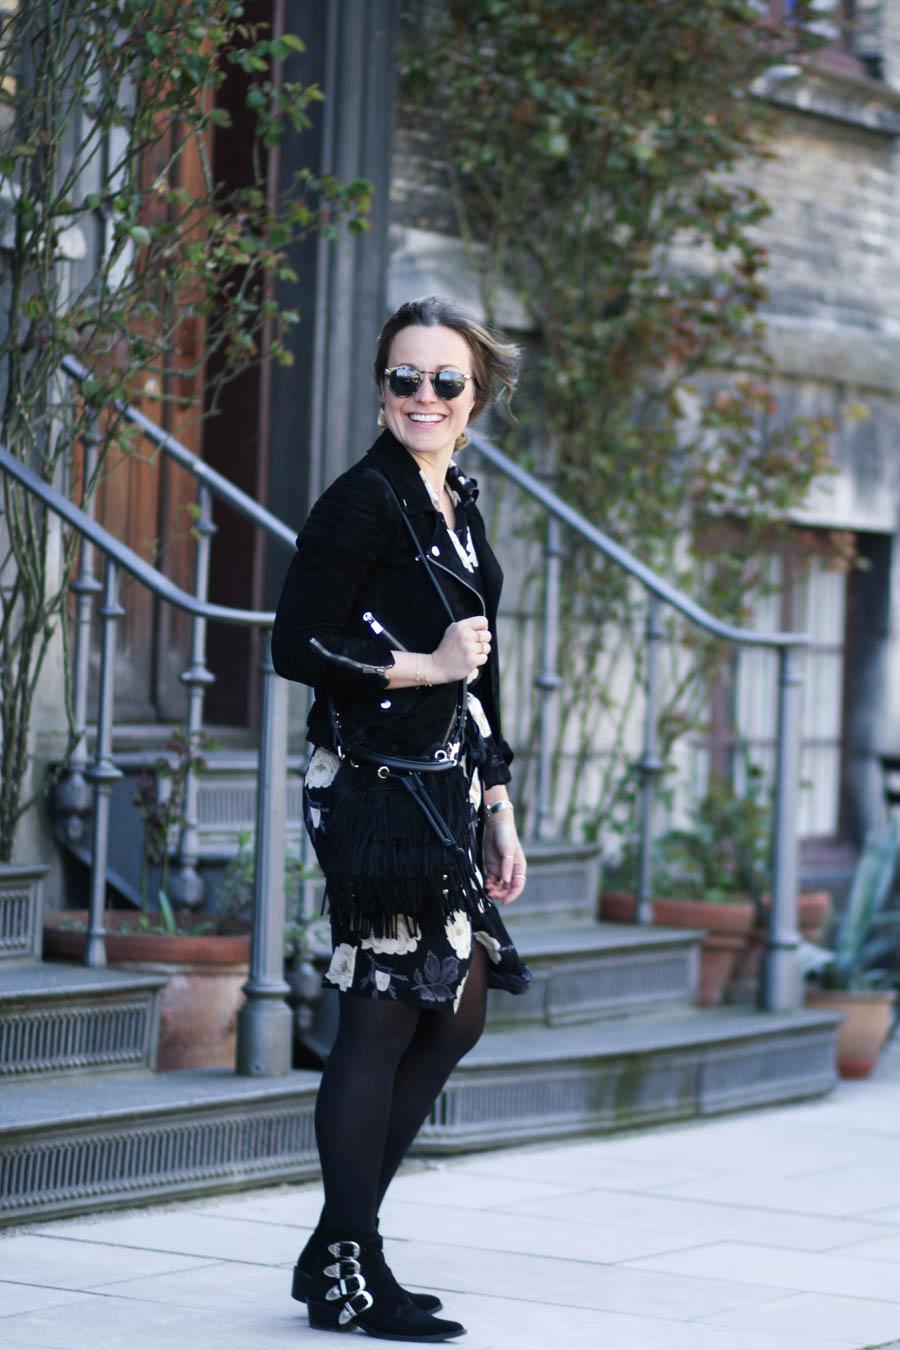 Emily Salomon blog photos by Marie My Nemesis Babe-21